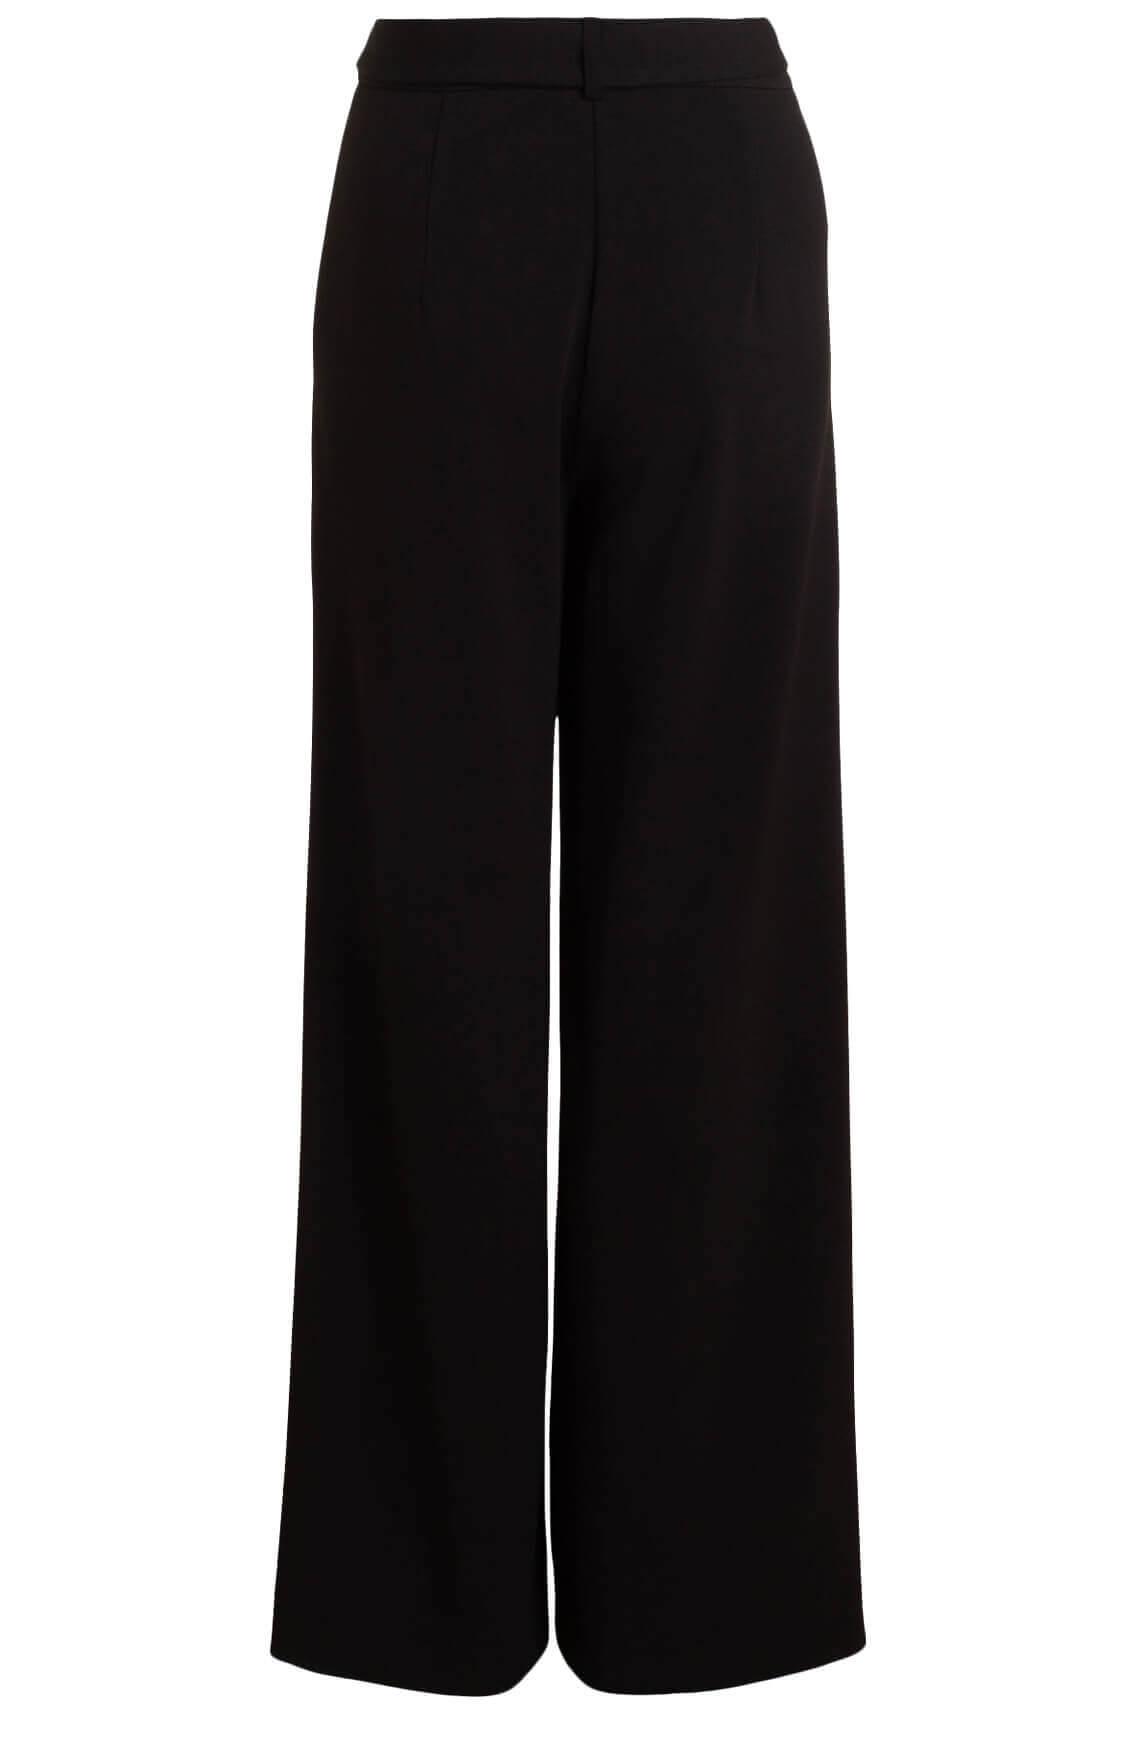 Anna Dames Flared broek met ceintuur zwart